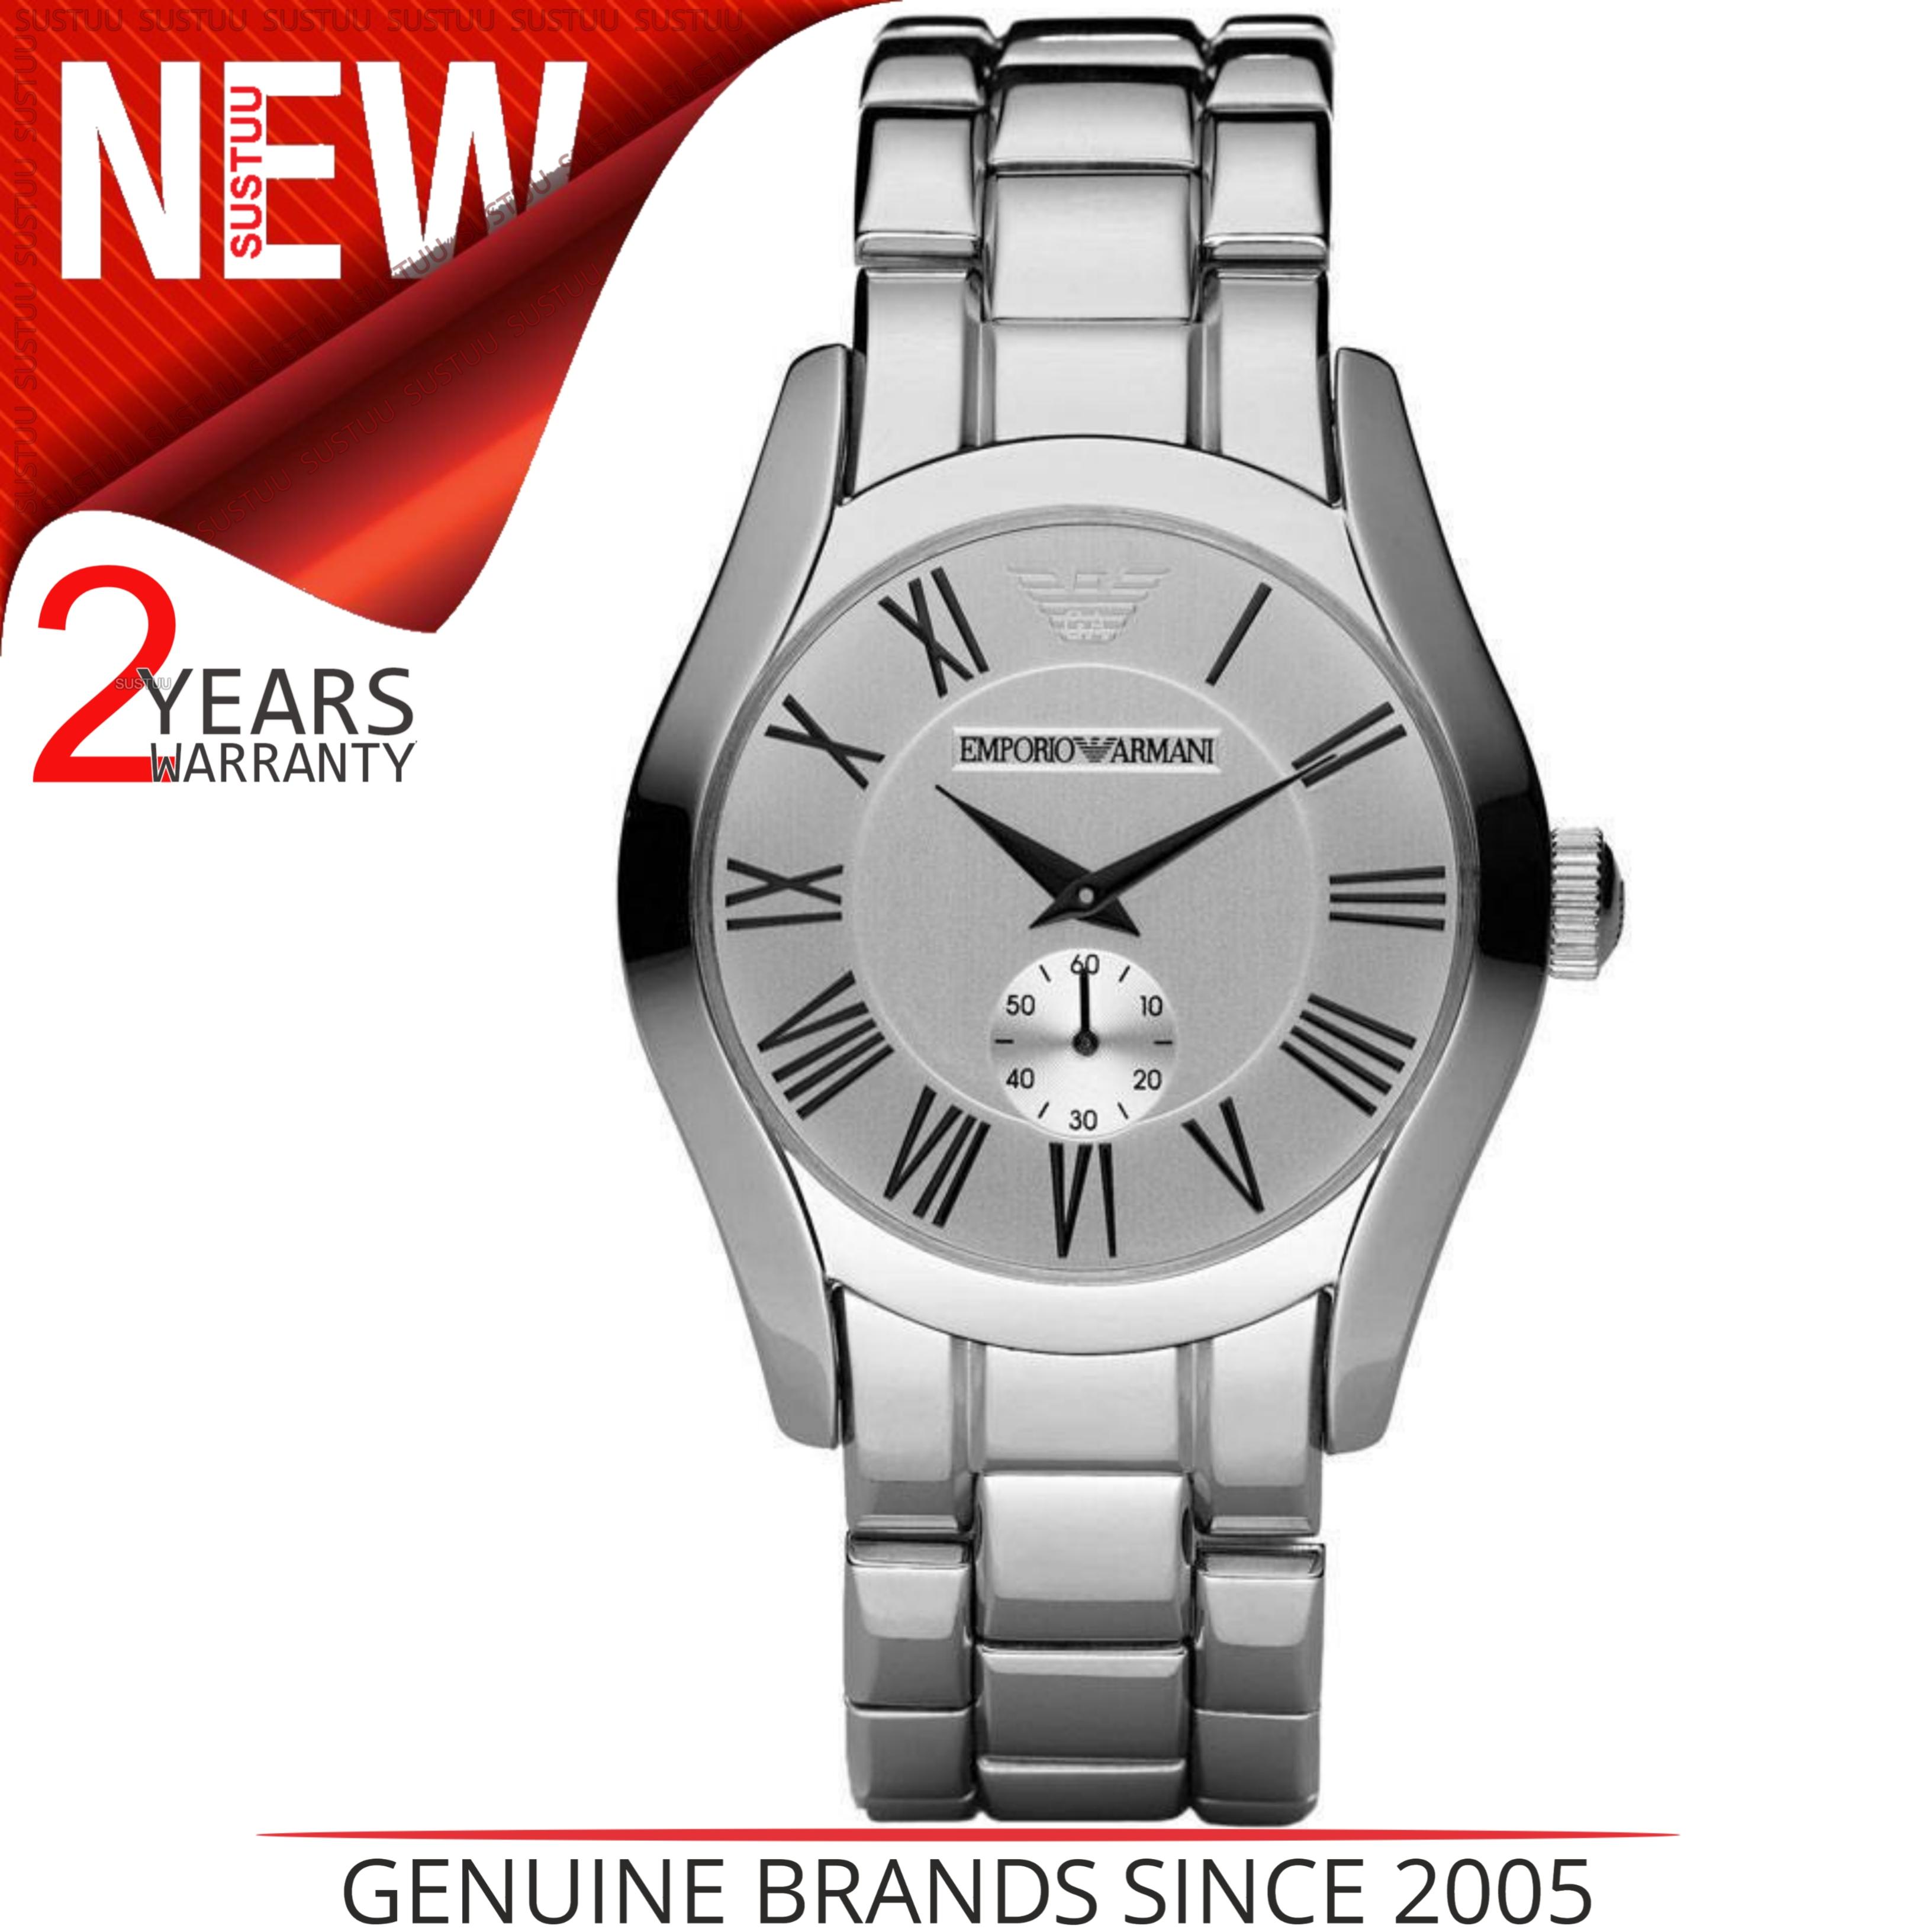 SENTINEL Watch│Silver Dial│Stainless design Strap│AR0647 Emporio Armani  classico maschile a1707a8e05